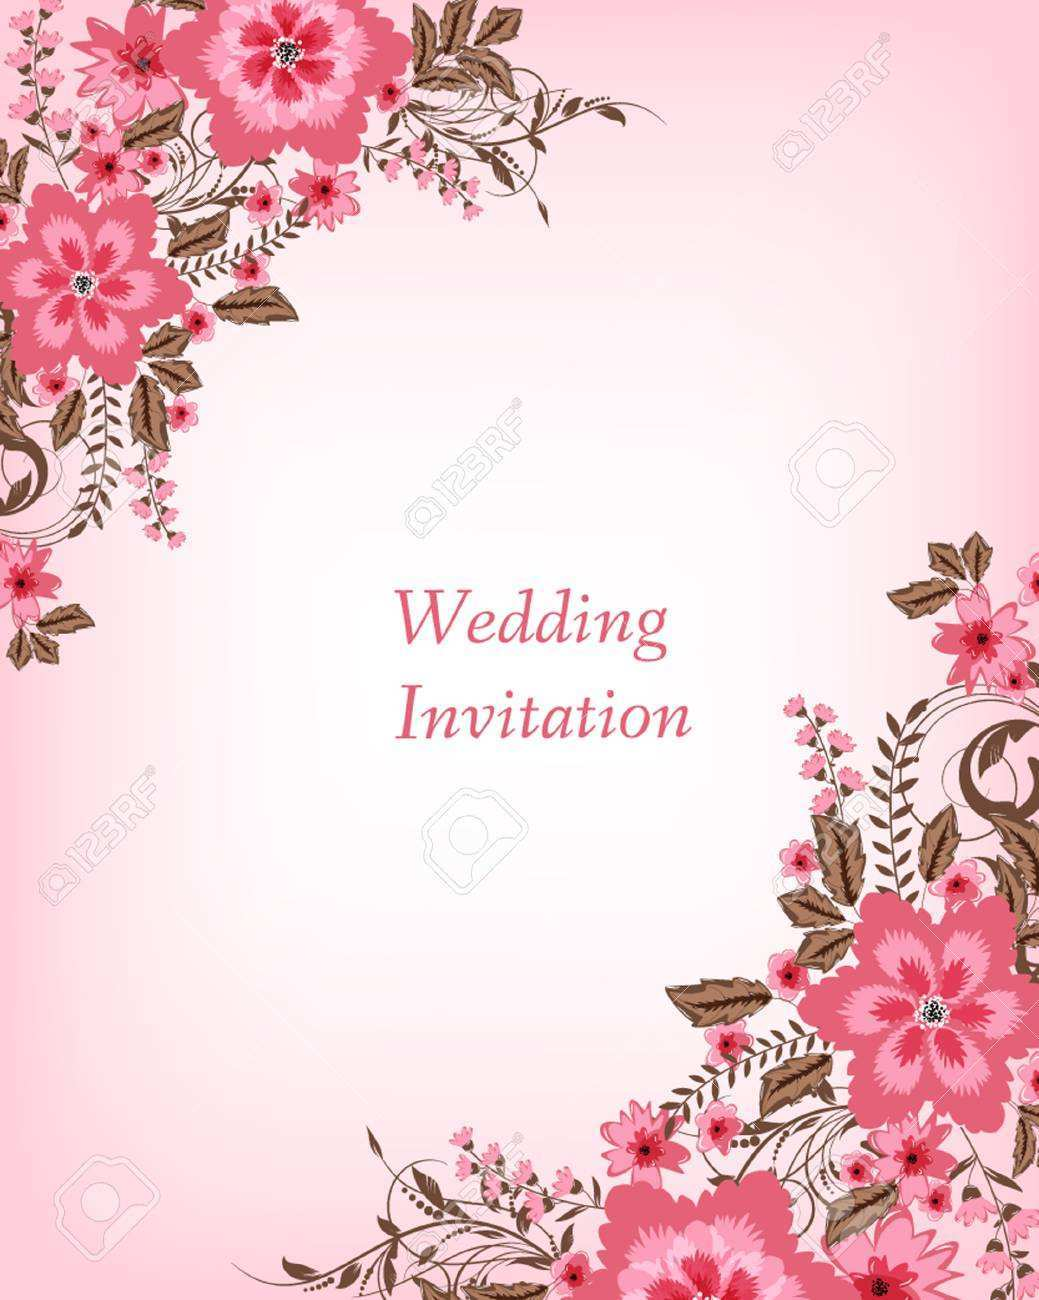 wedding invitations card background